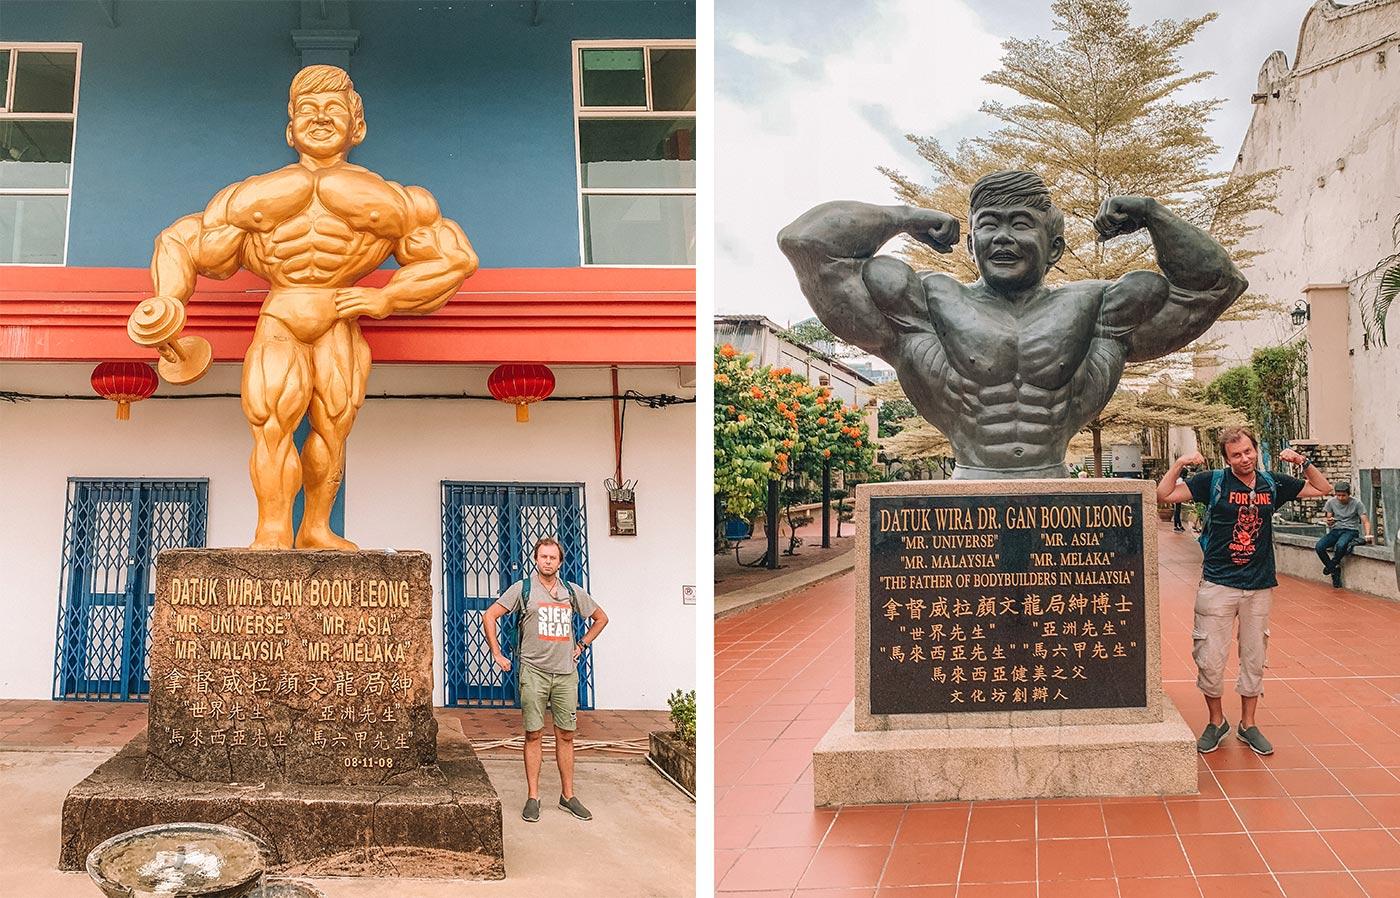 Top things to do in Melaka / Malacca Malaysia | blog post | Melaka Bodybuilding Statues - Datuk Wira Dr. Gan Boon Leong